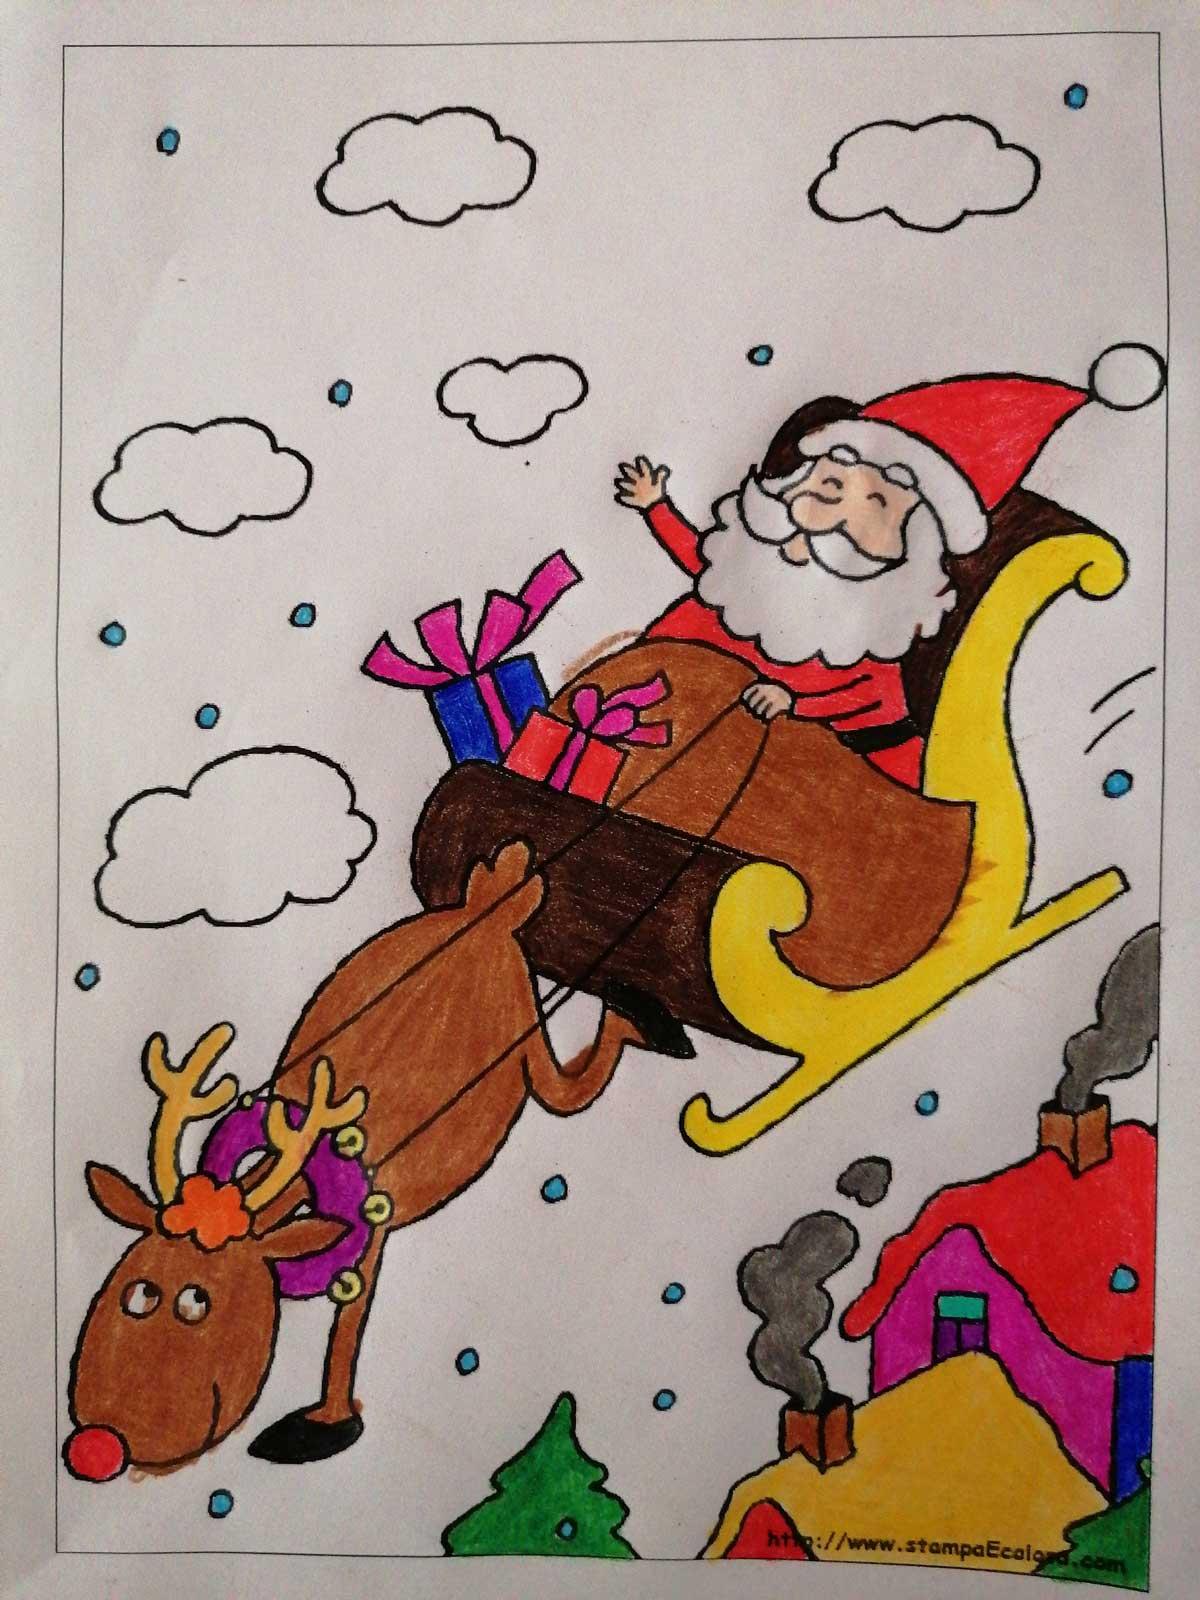 92.-Babbo-Natale-e-la-renna-Rudolph-volano-sulla-slitta_Christel